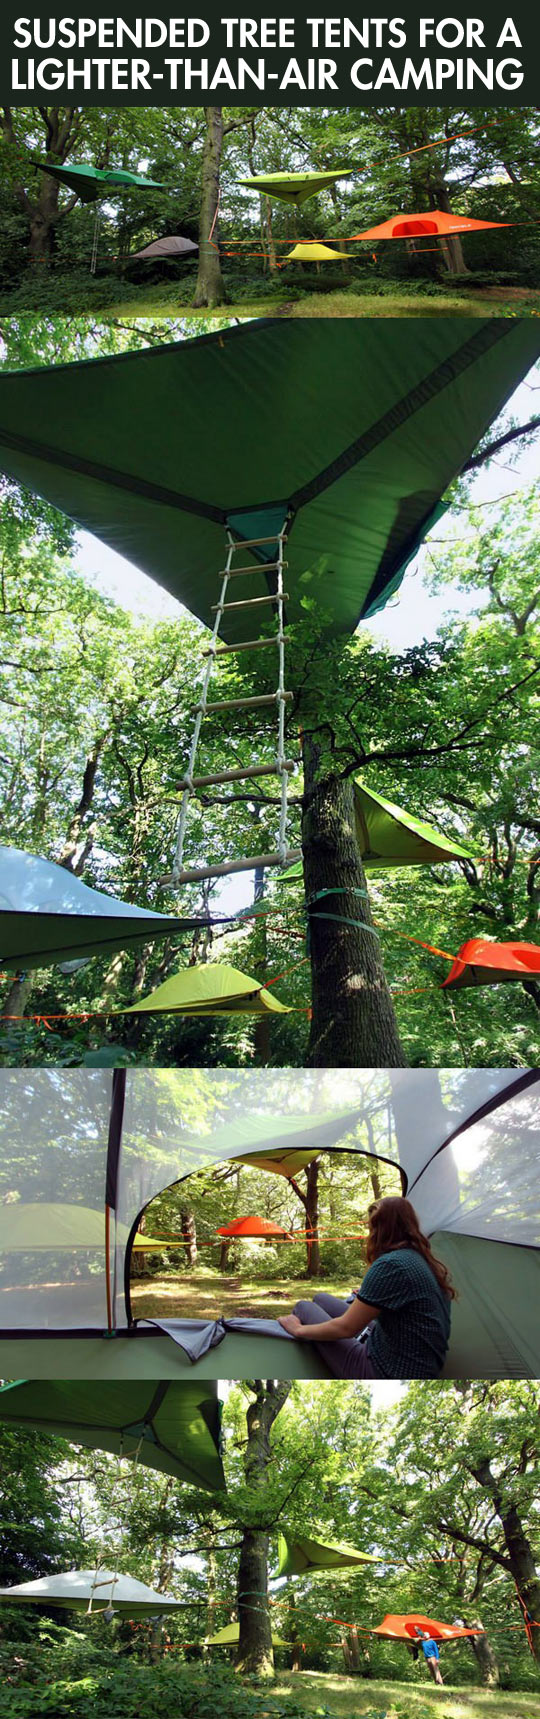 Tree tents...